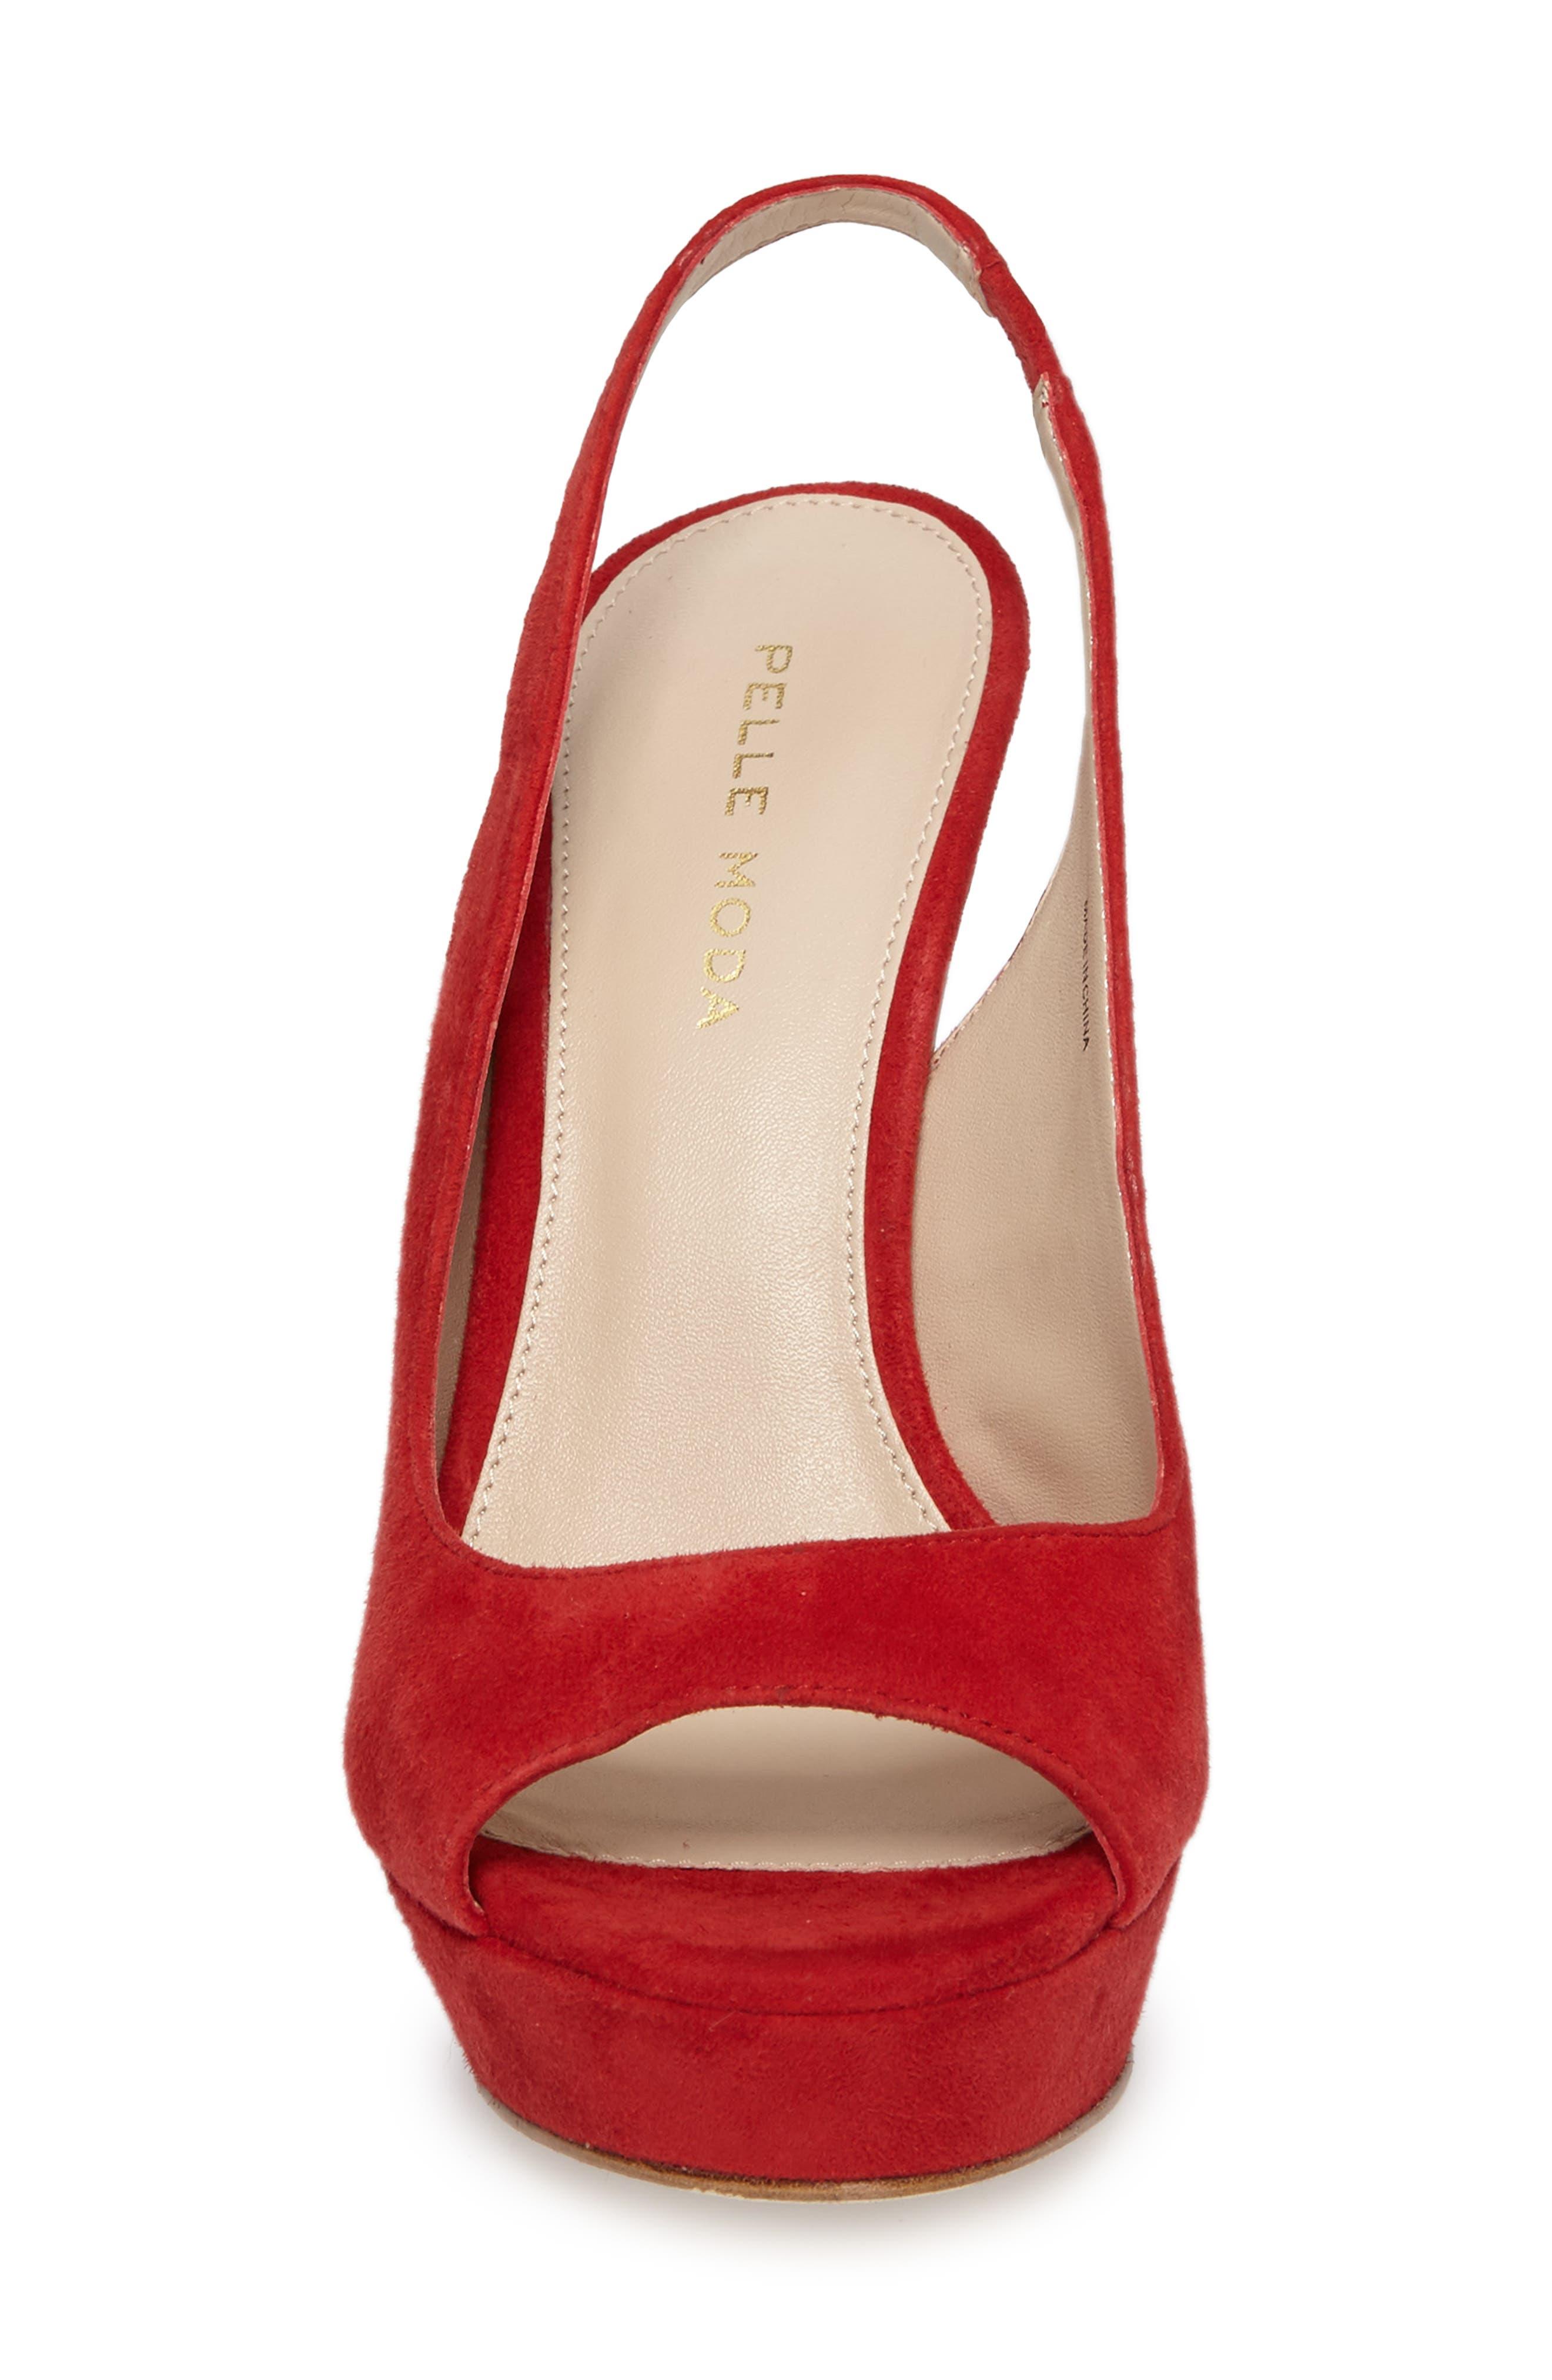 Oana Slingback Platform Sandal,                             Alternate thumbnail 4, color,                             Lipstick Suede